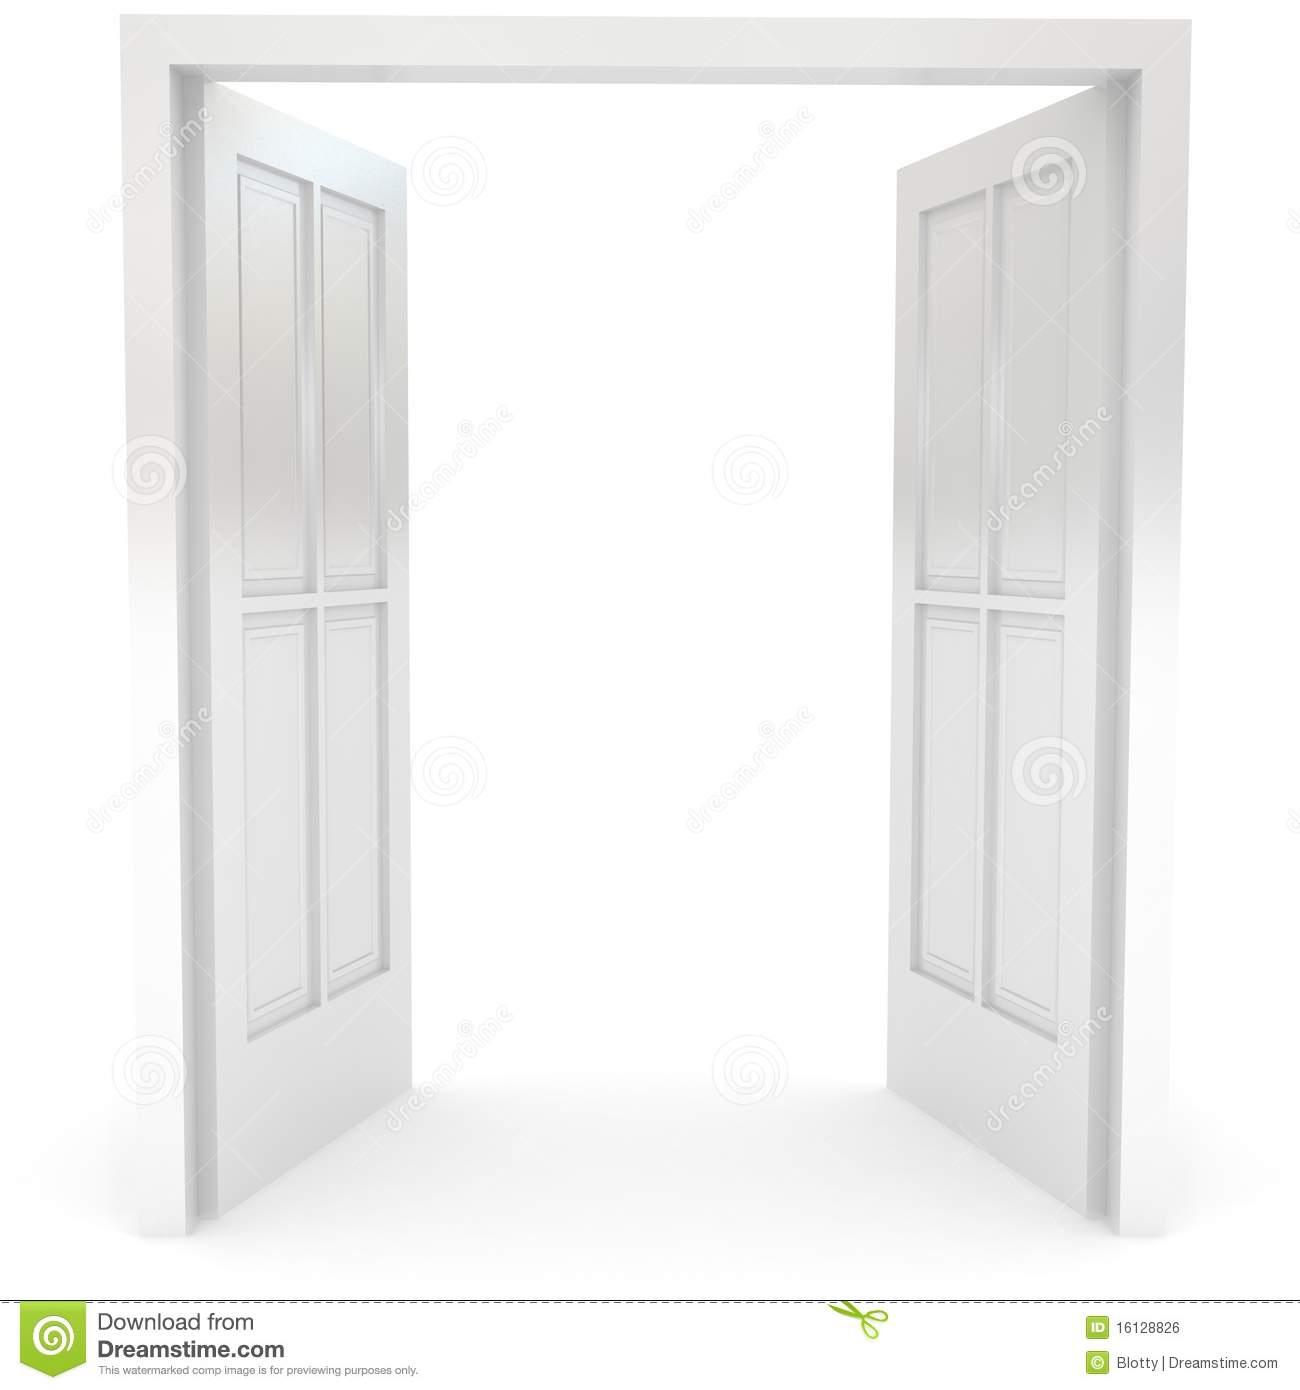 Double door clipart image freeuse Open Double Door Clipart Inspiration 211925 Doors - hyunky.com image freeuse